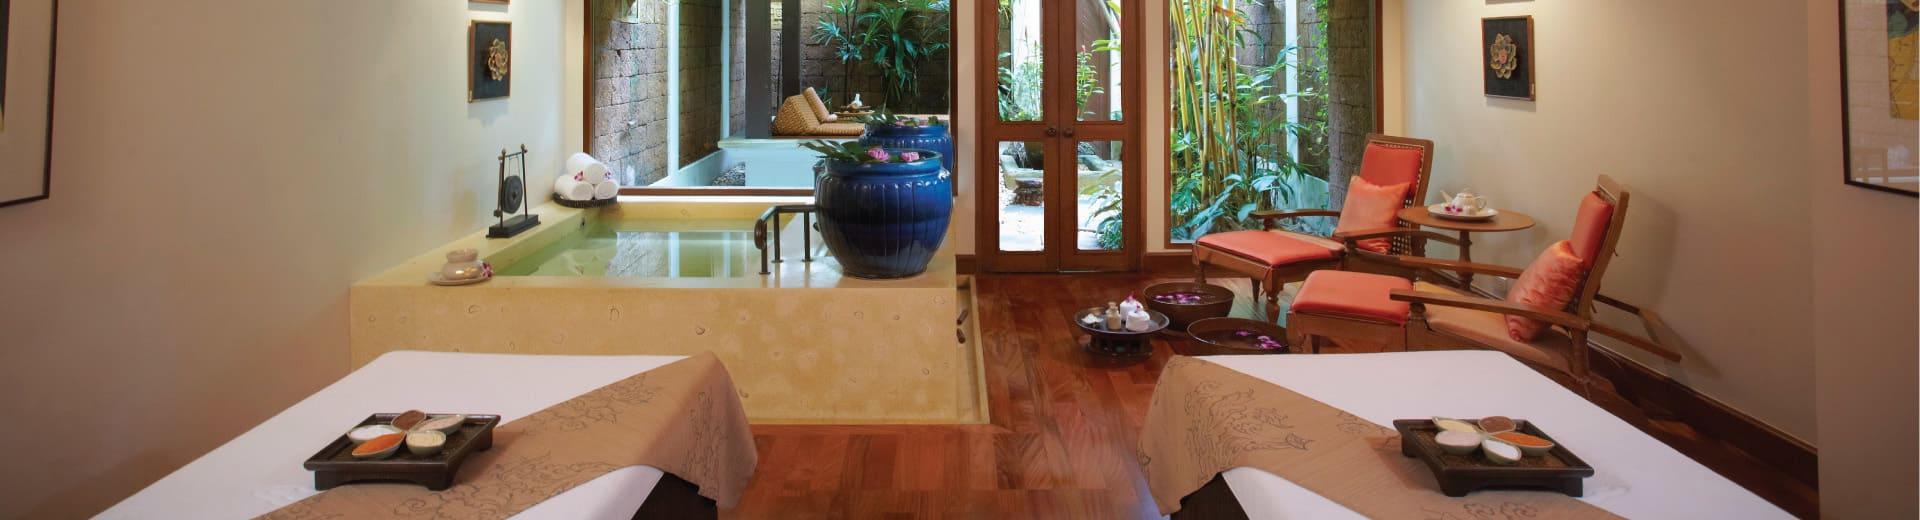 river kwai thai massage eskorter i helsingborg